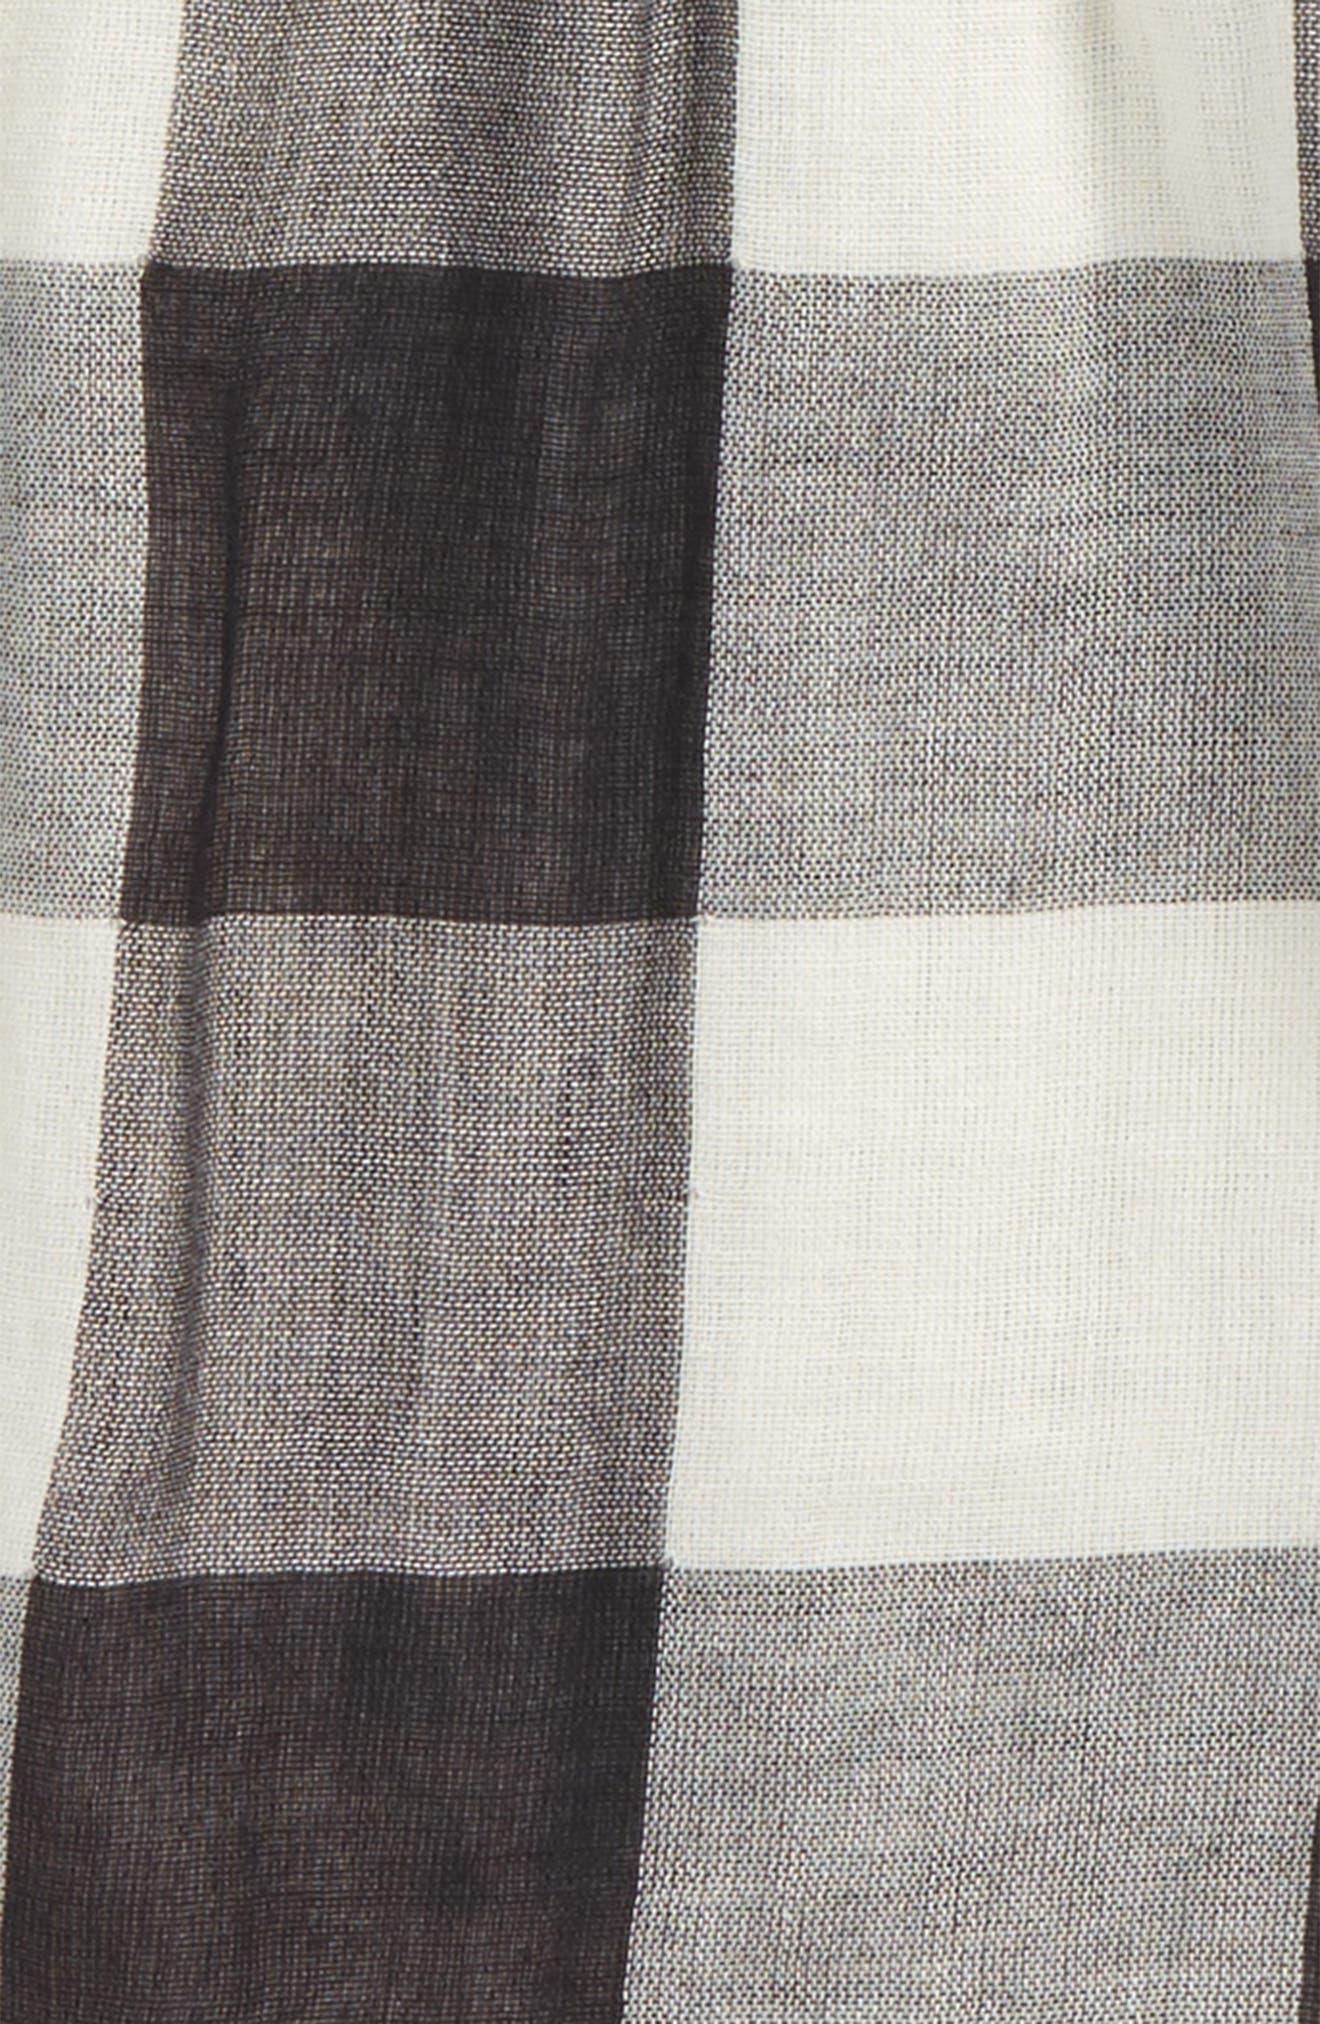 Woven Check Top,                             Alternate thumbnail 2, color,                             Black- Ivory Check